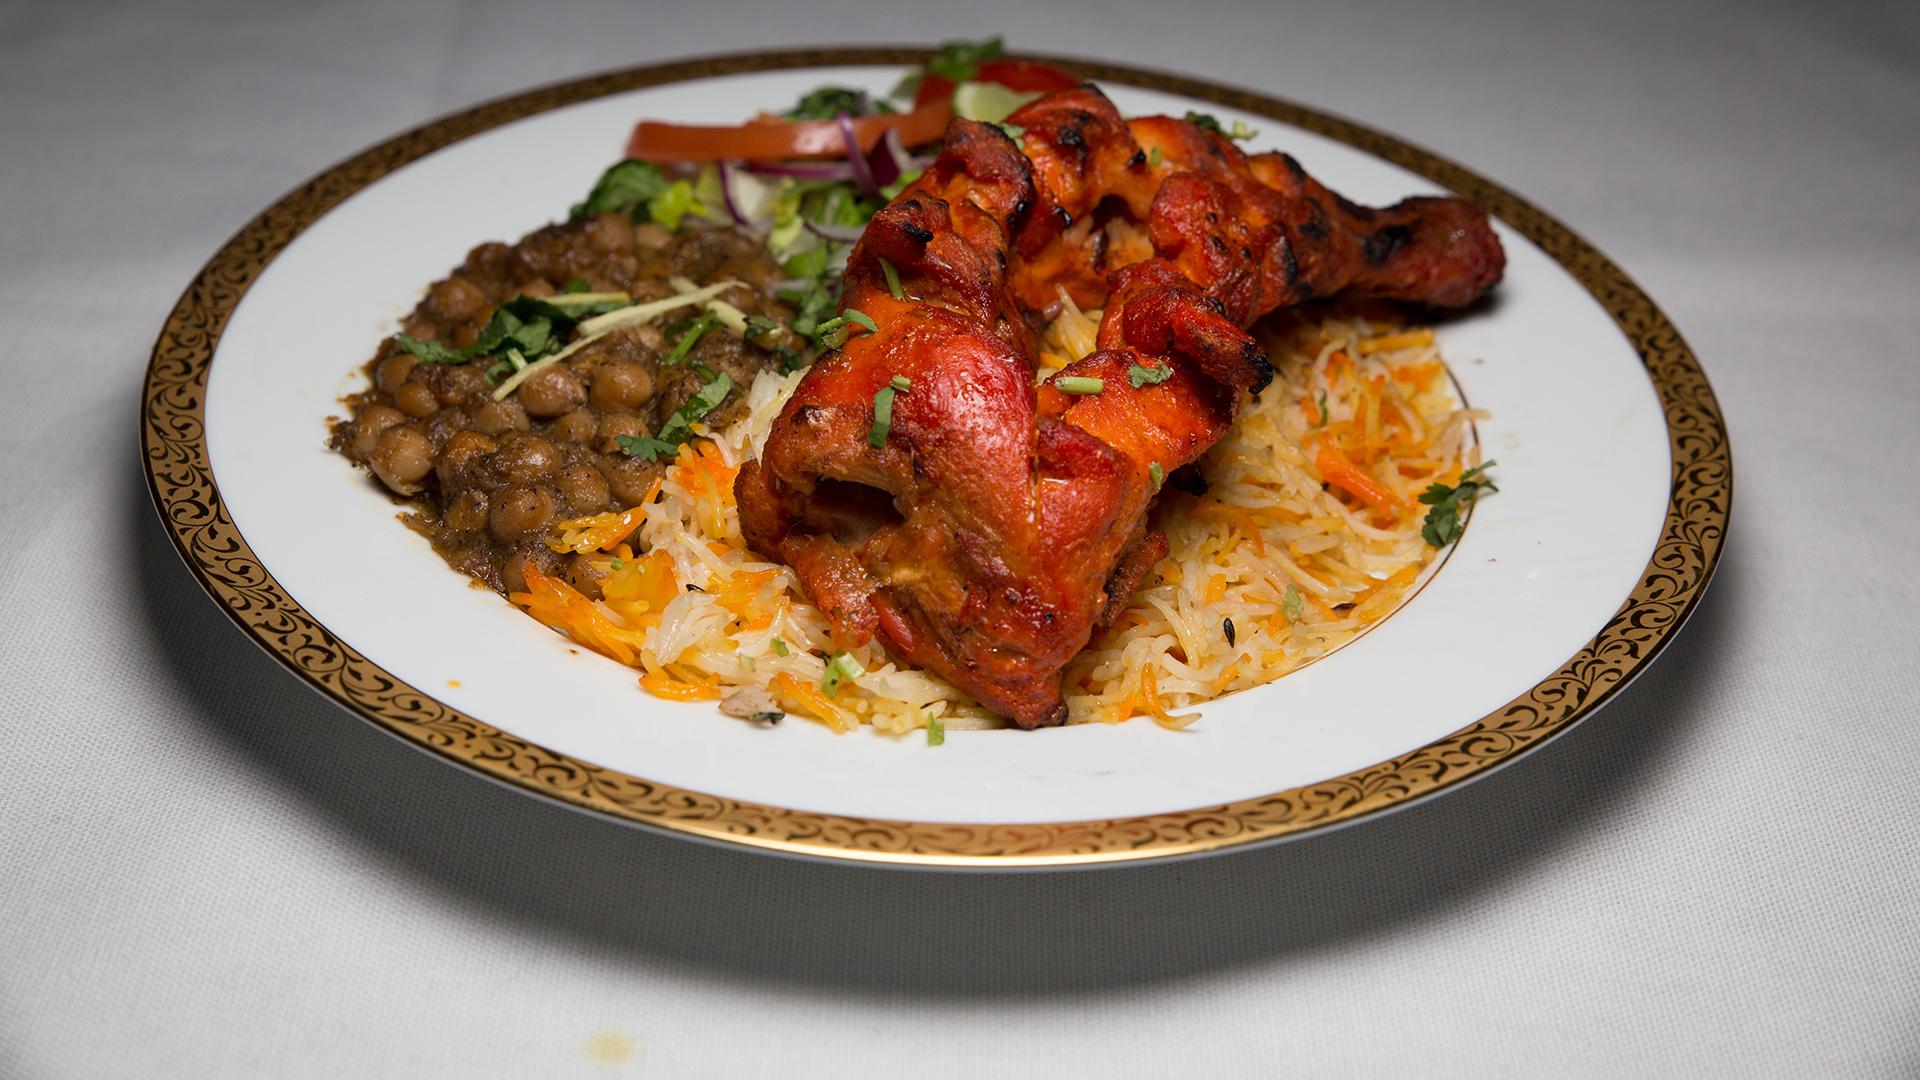 Tandoori Chicken Meal